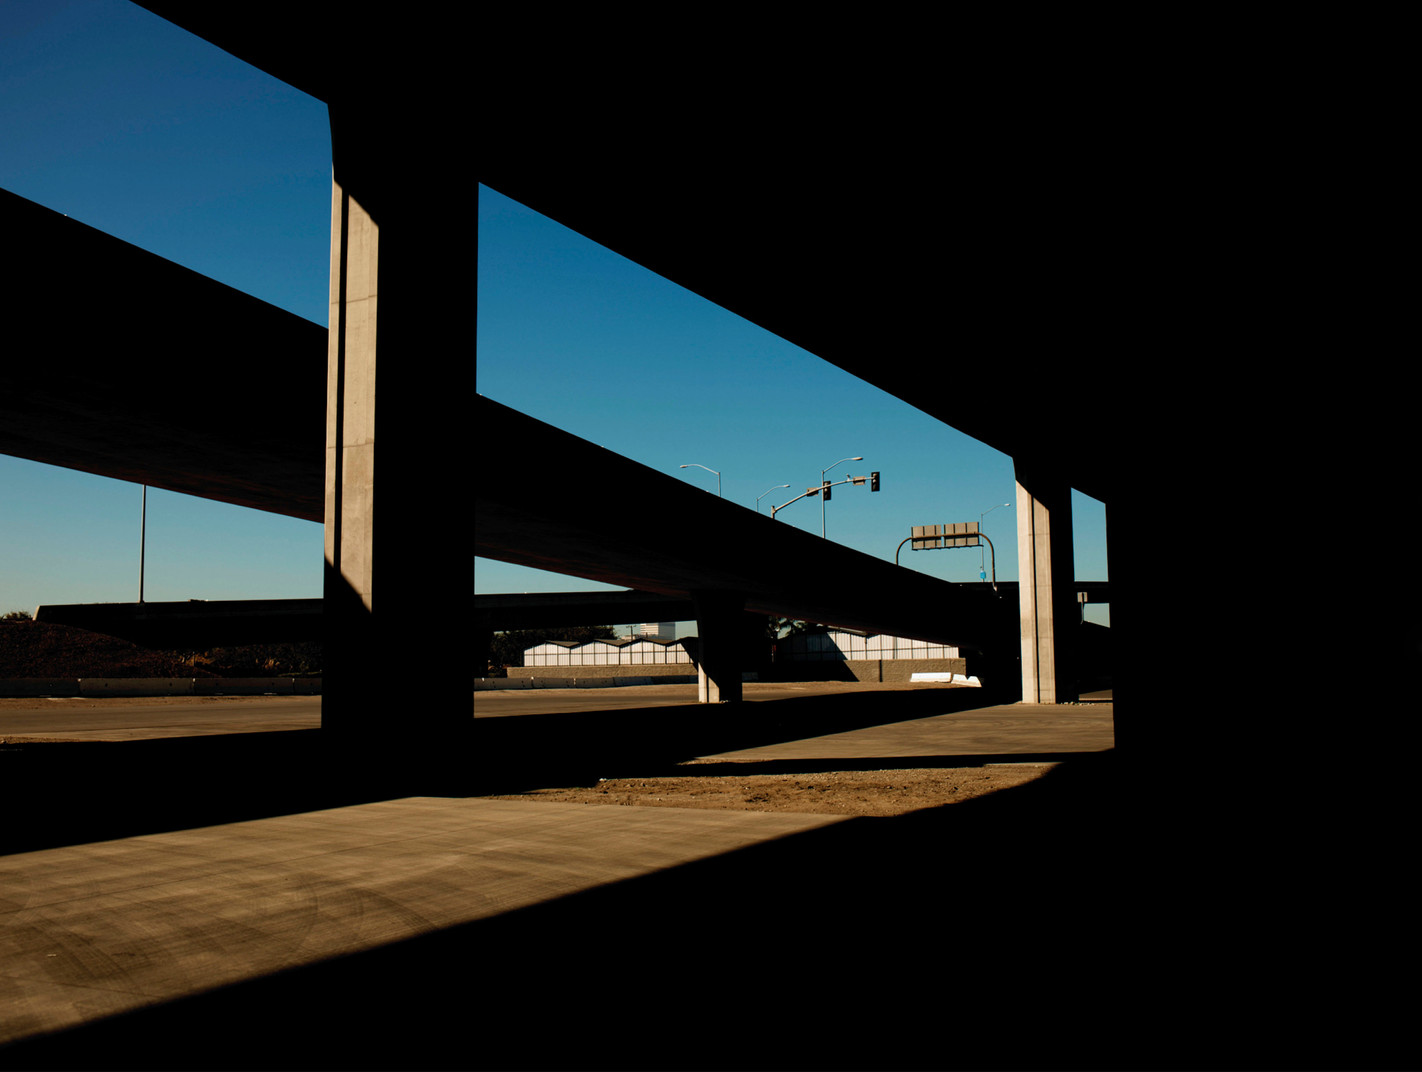 henri_coutant_photographer_los_angeles_h